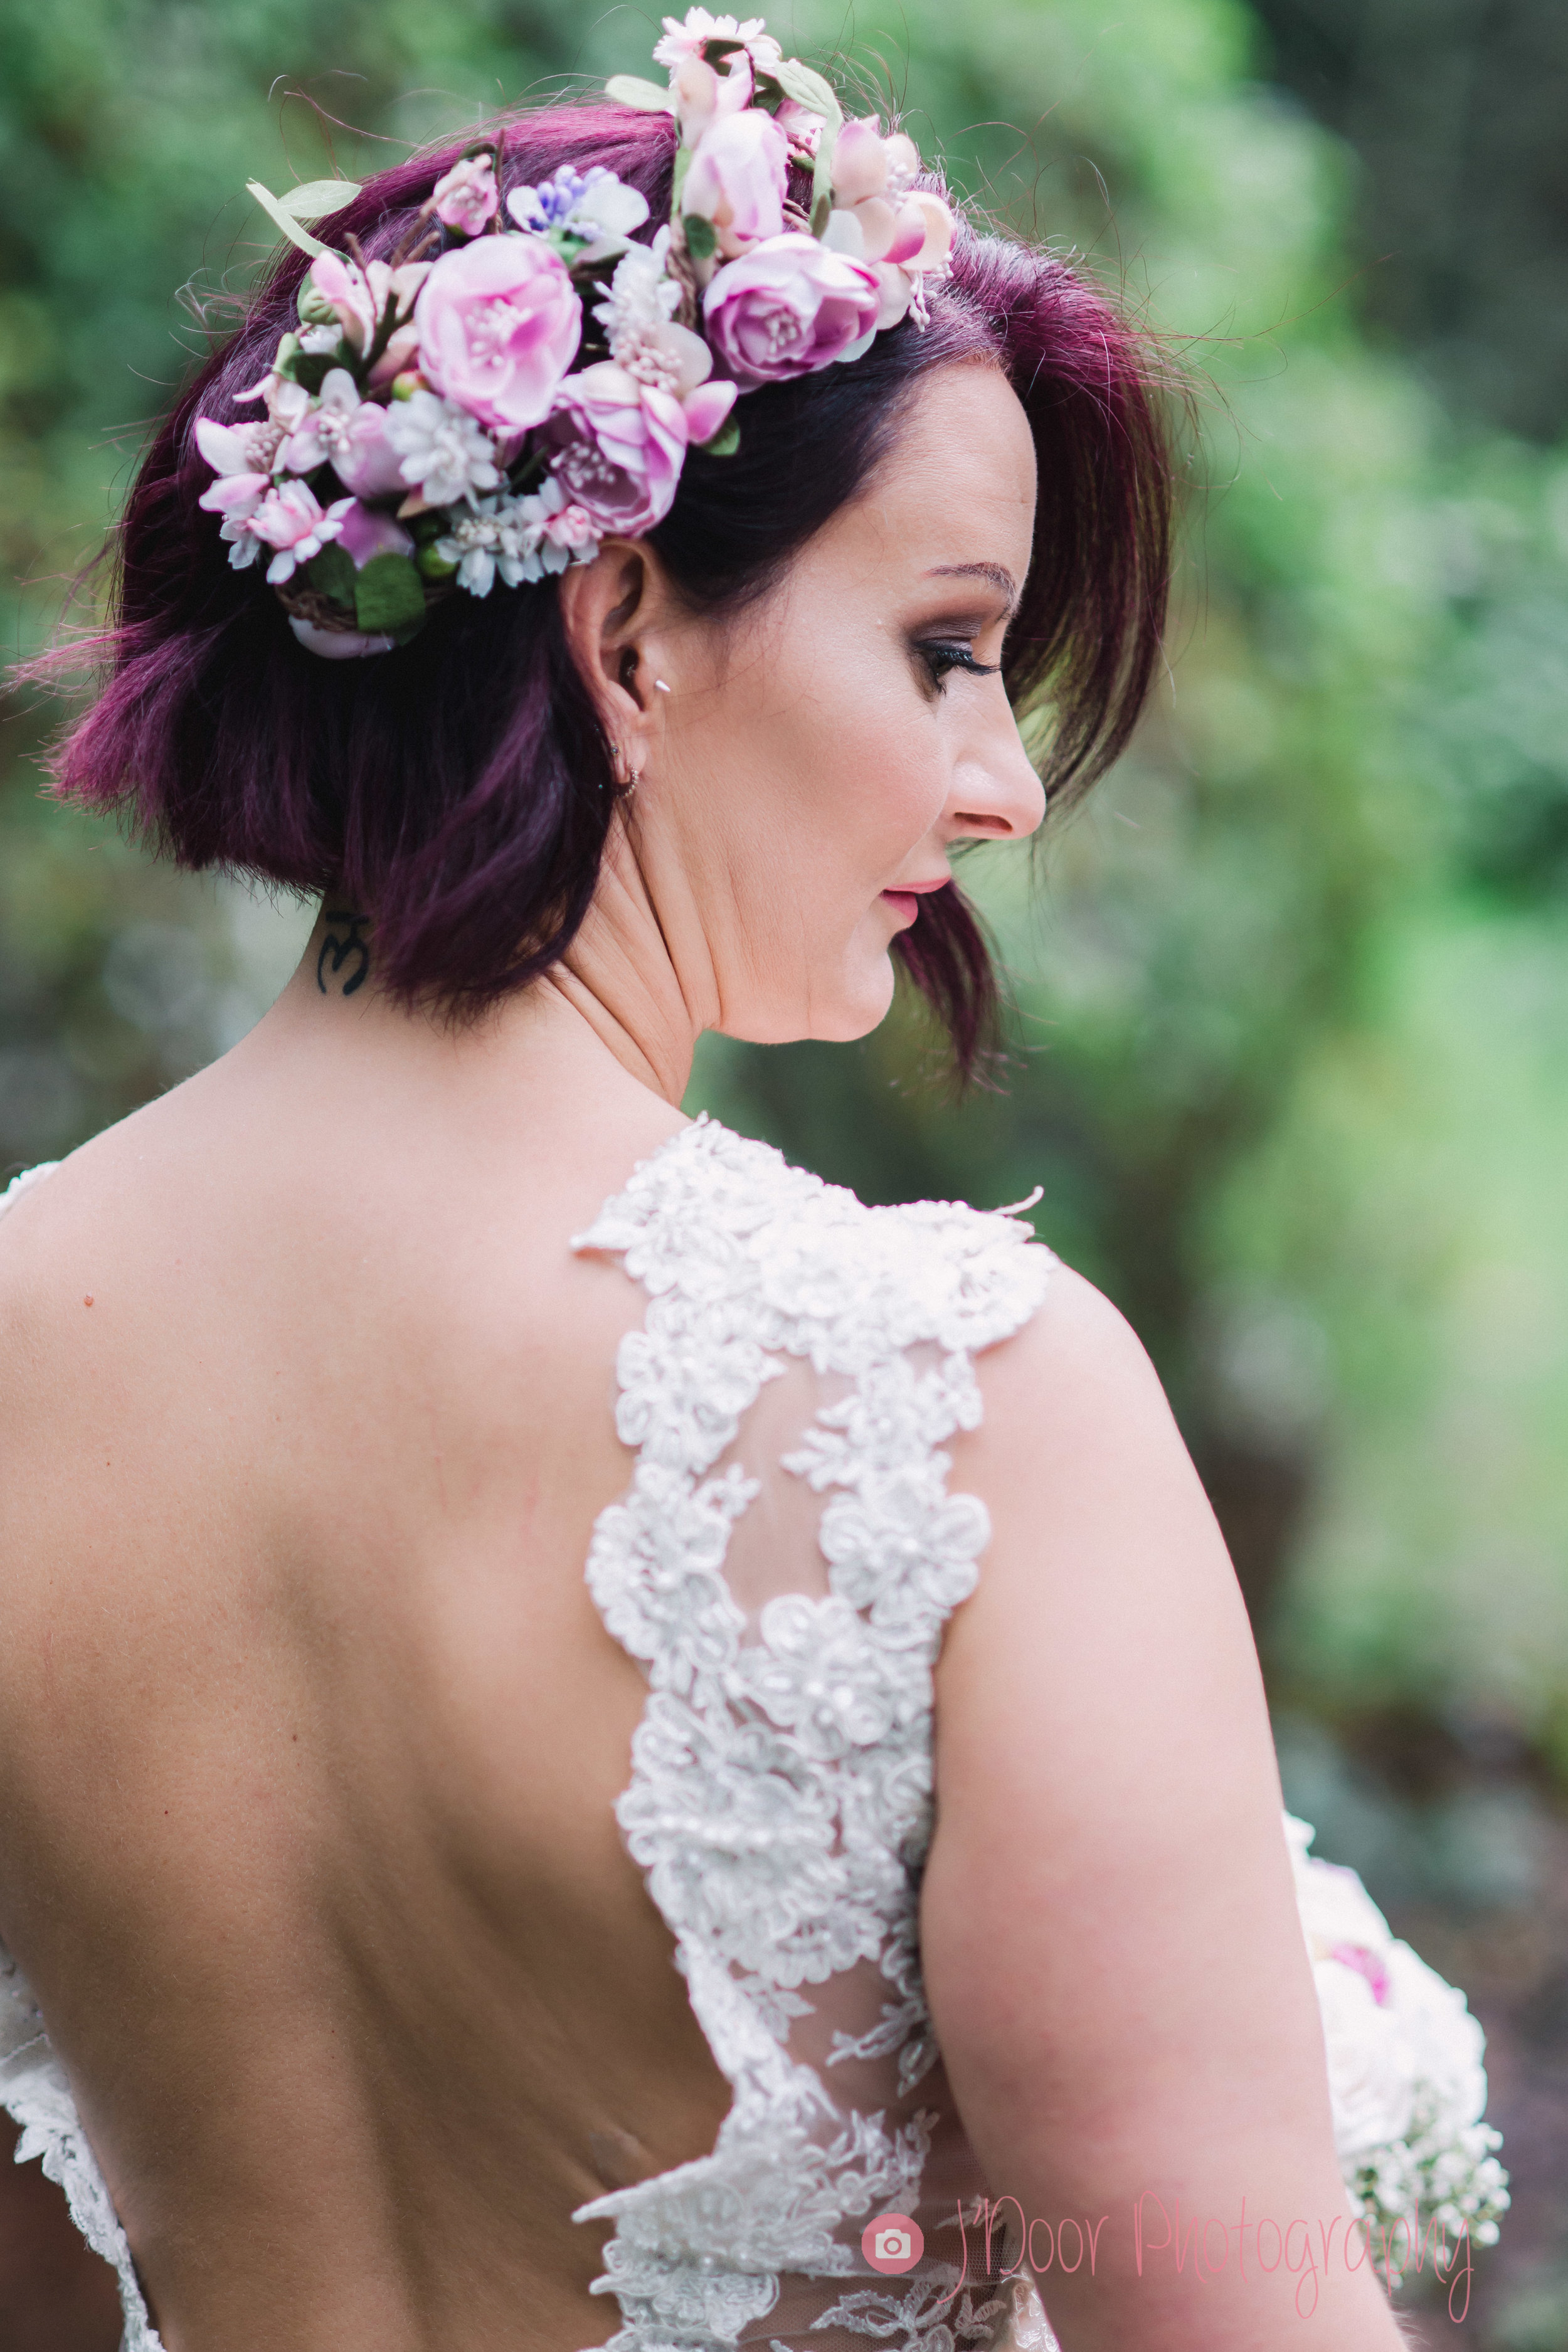 Flowers at Louisa Jane Florist, Hair by Emma J Hair Styling, Makeup by Mel Miller Makeup